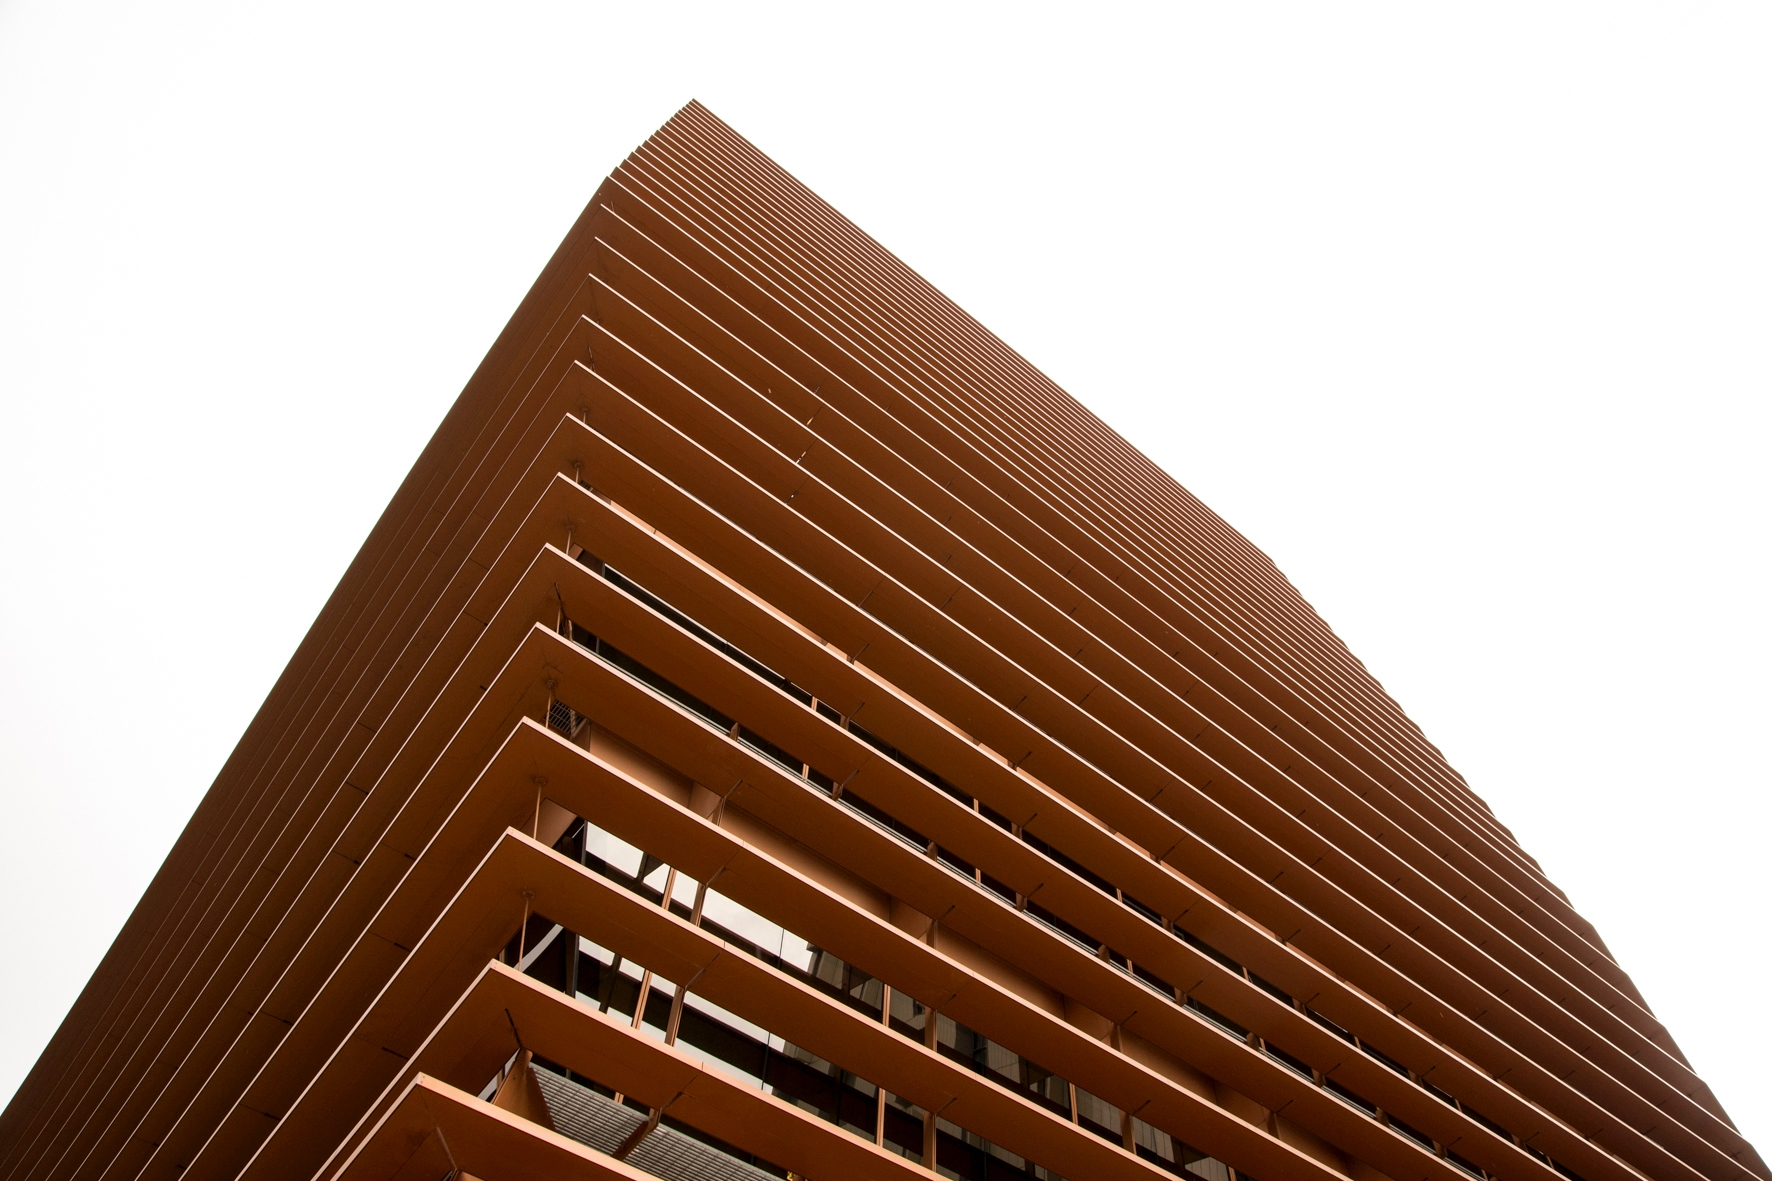 Barcelona Architecture Series D - alexreigworks | ello